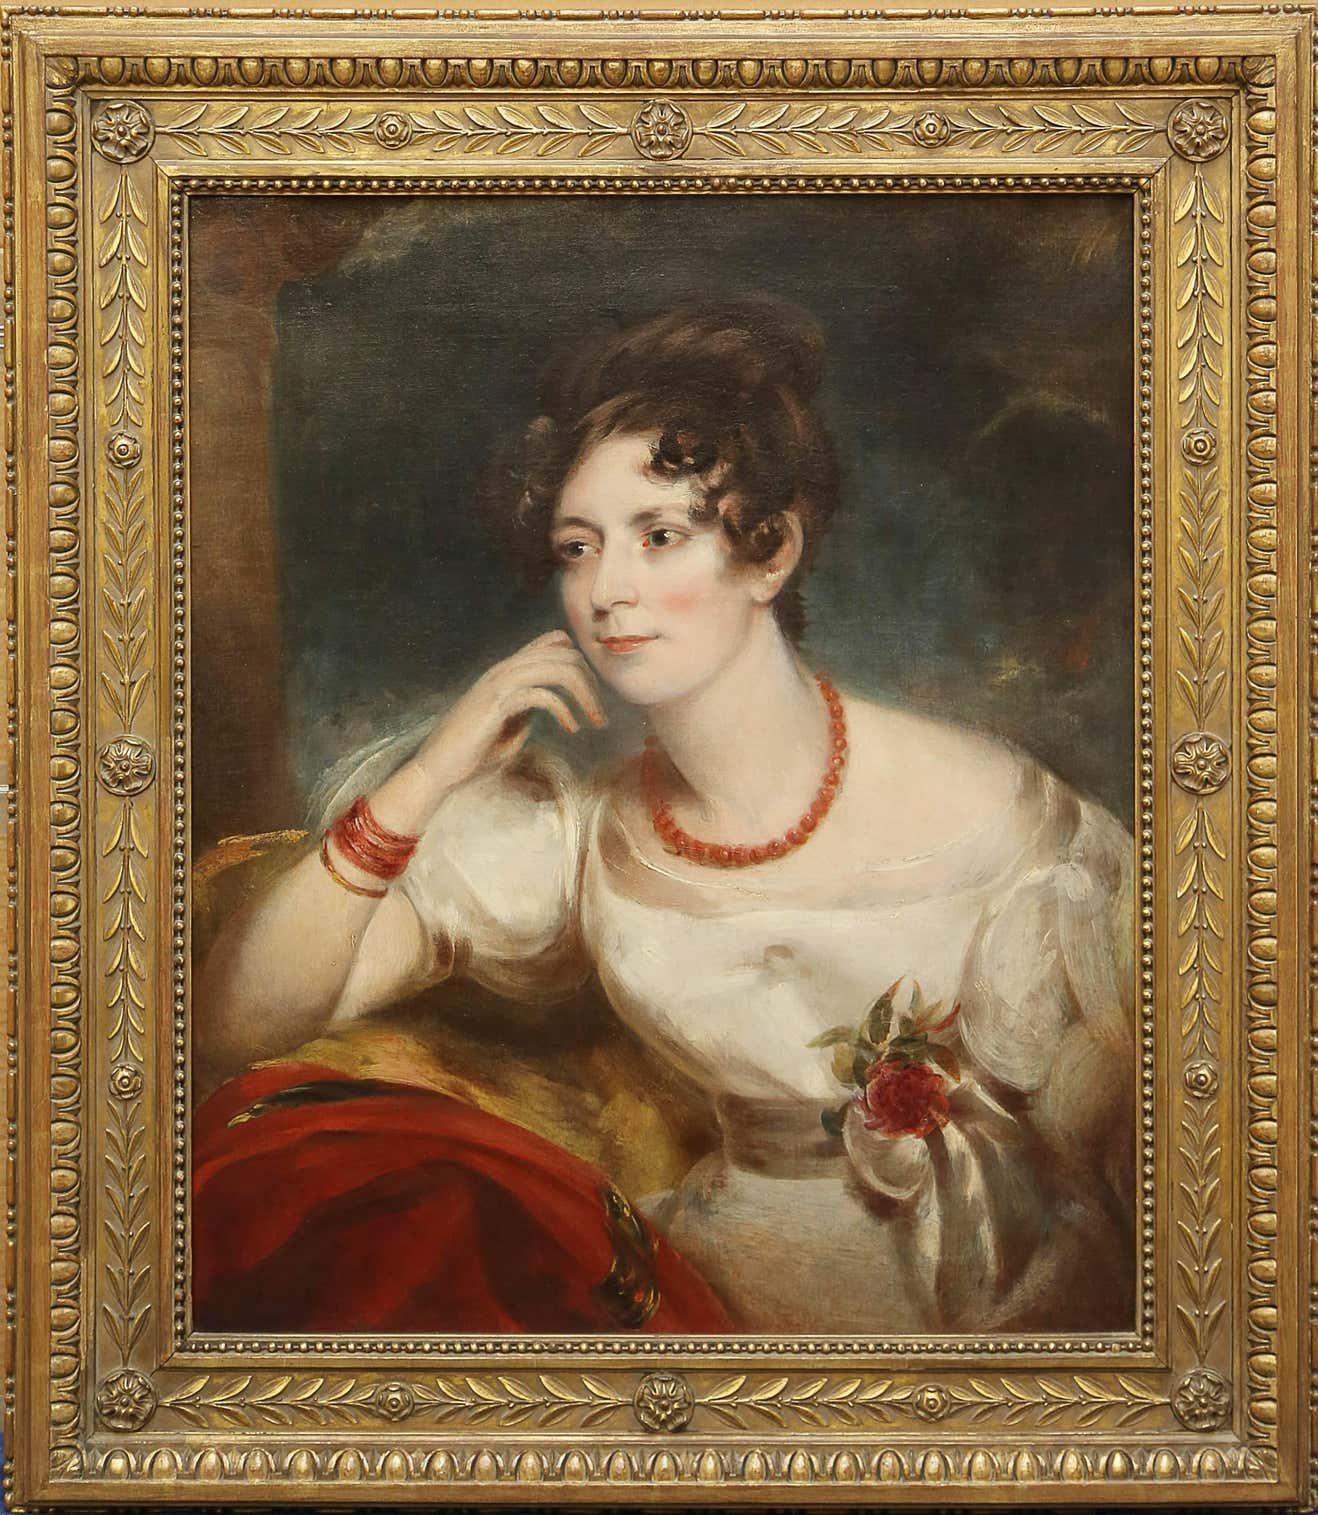 Portrait of Princess Sophia Matilda of Gloucester